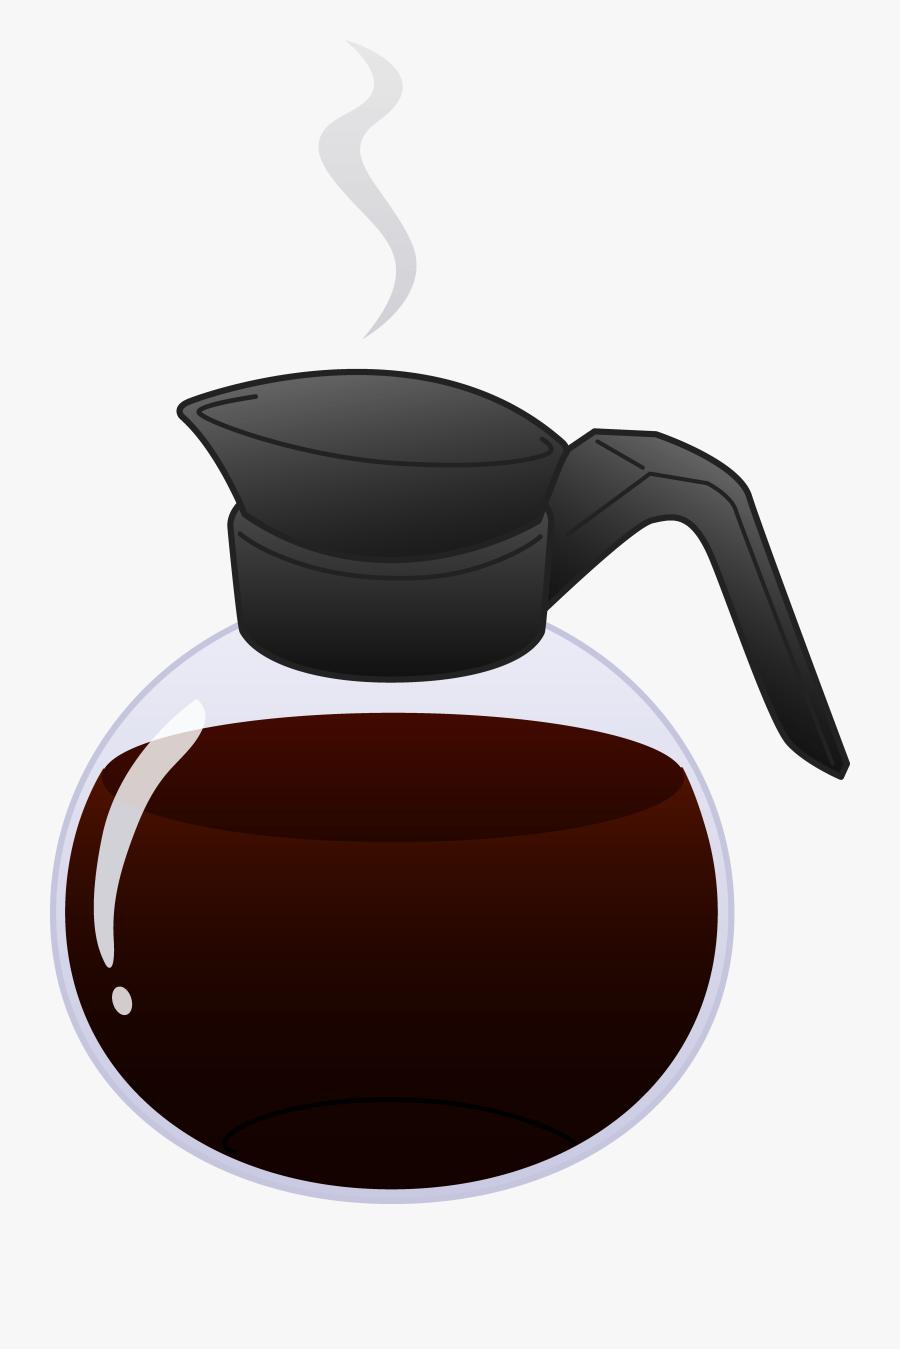 Hot Coffee Image - Coffee Machine Transparent Cartoon, Transparent Clipart